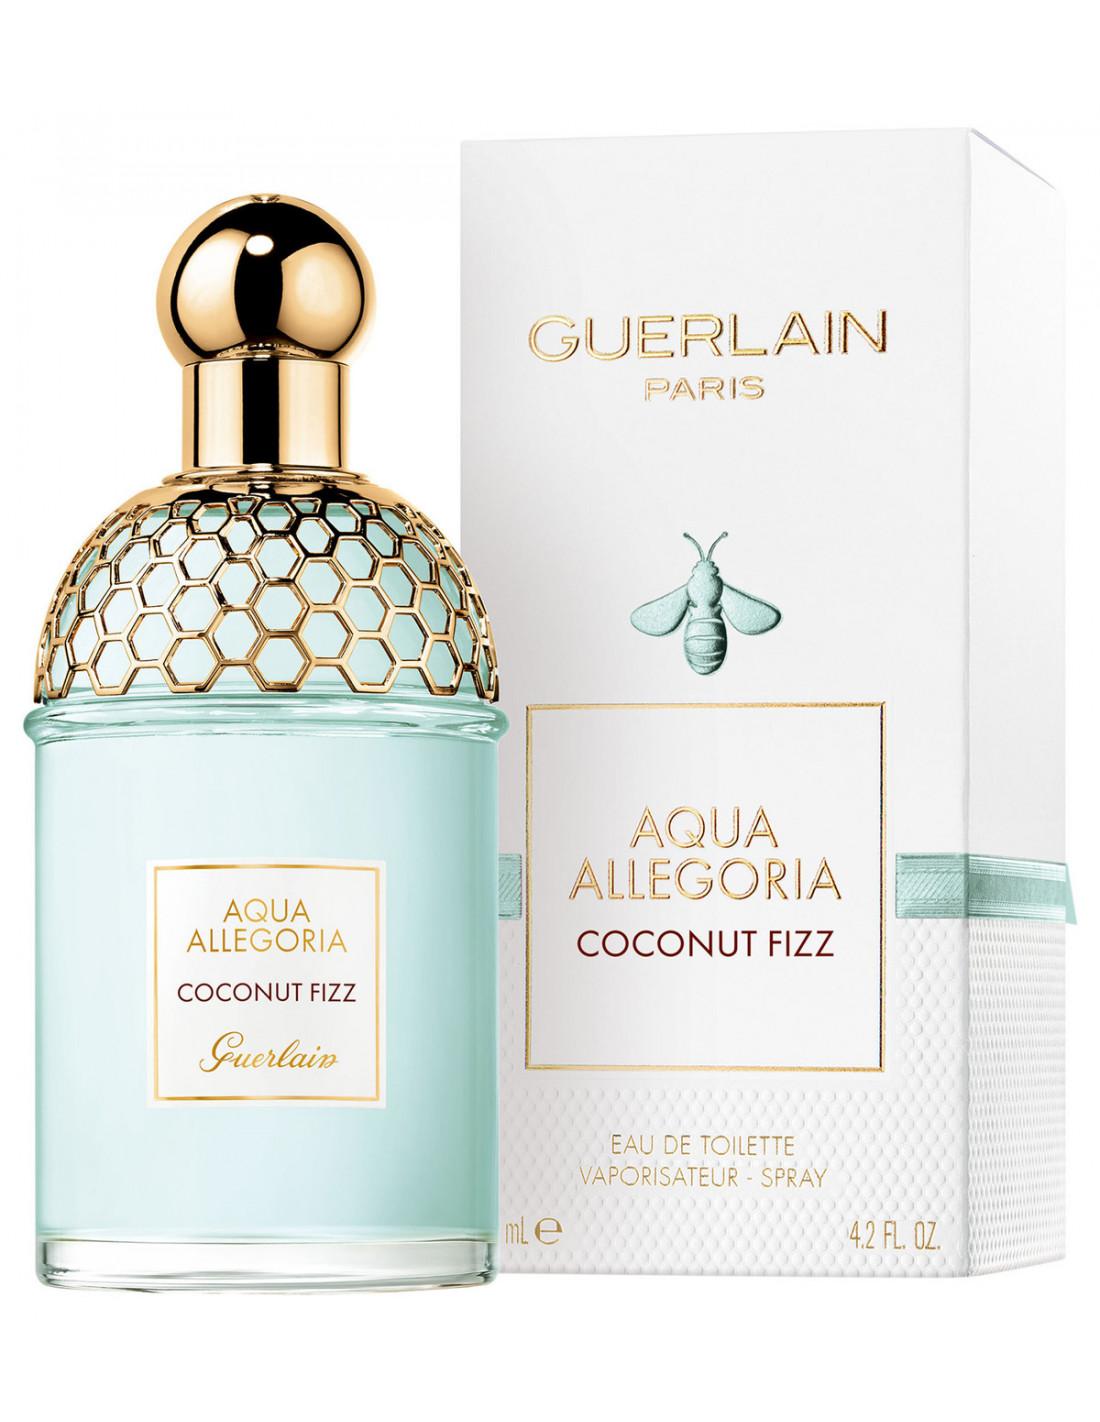 Aqua Allegoria Coconut Fizz Eau de Toilette